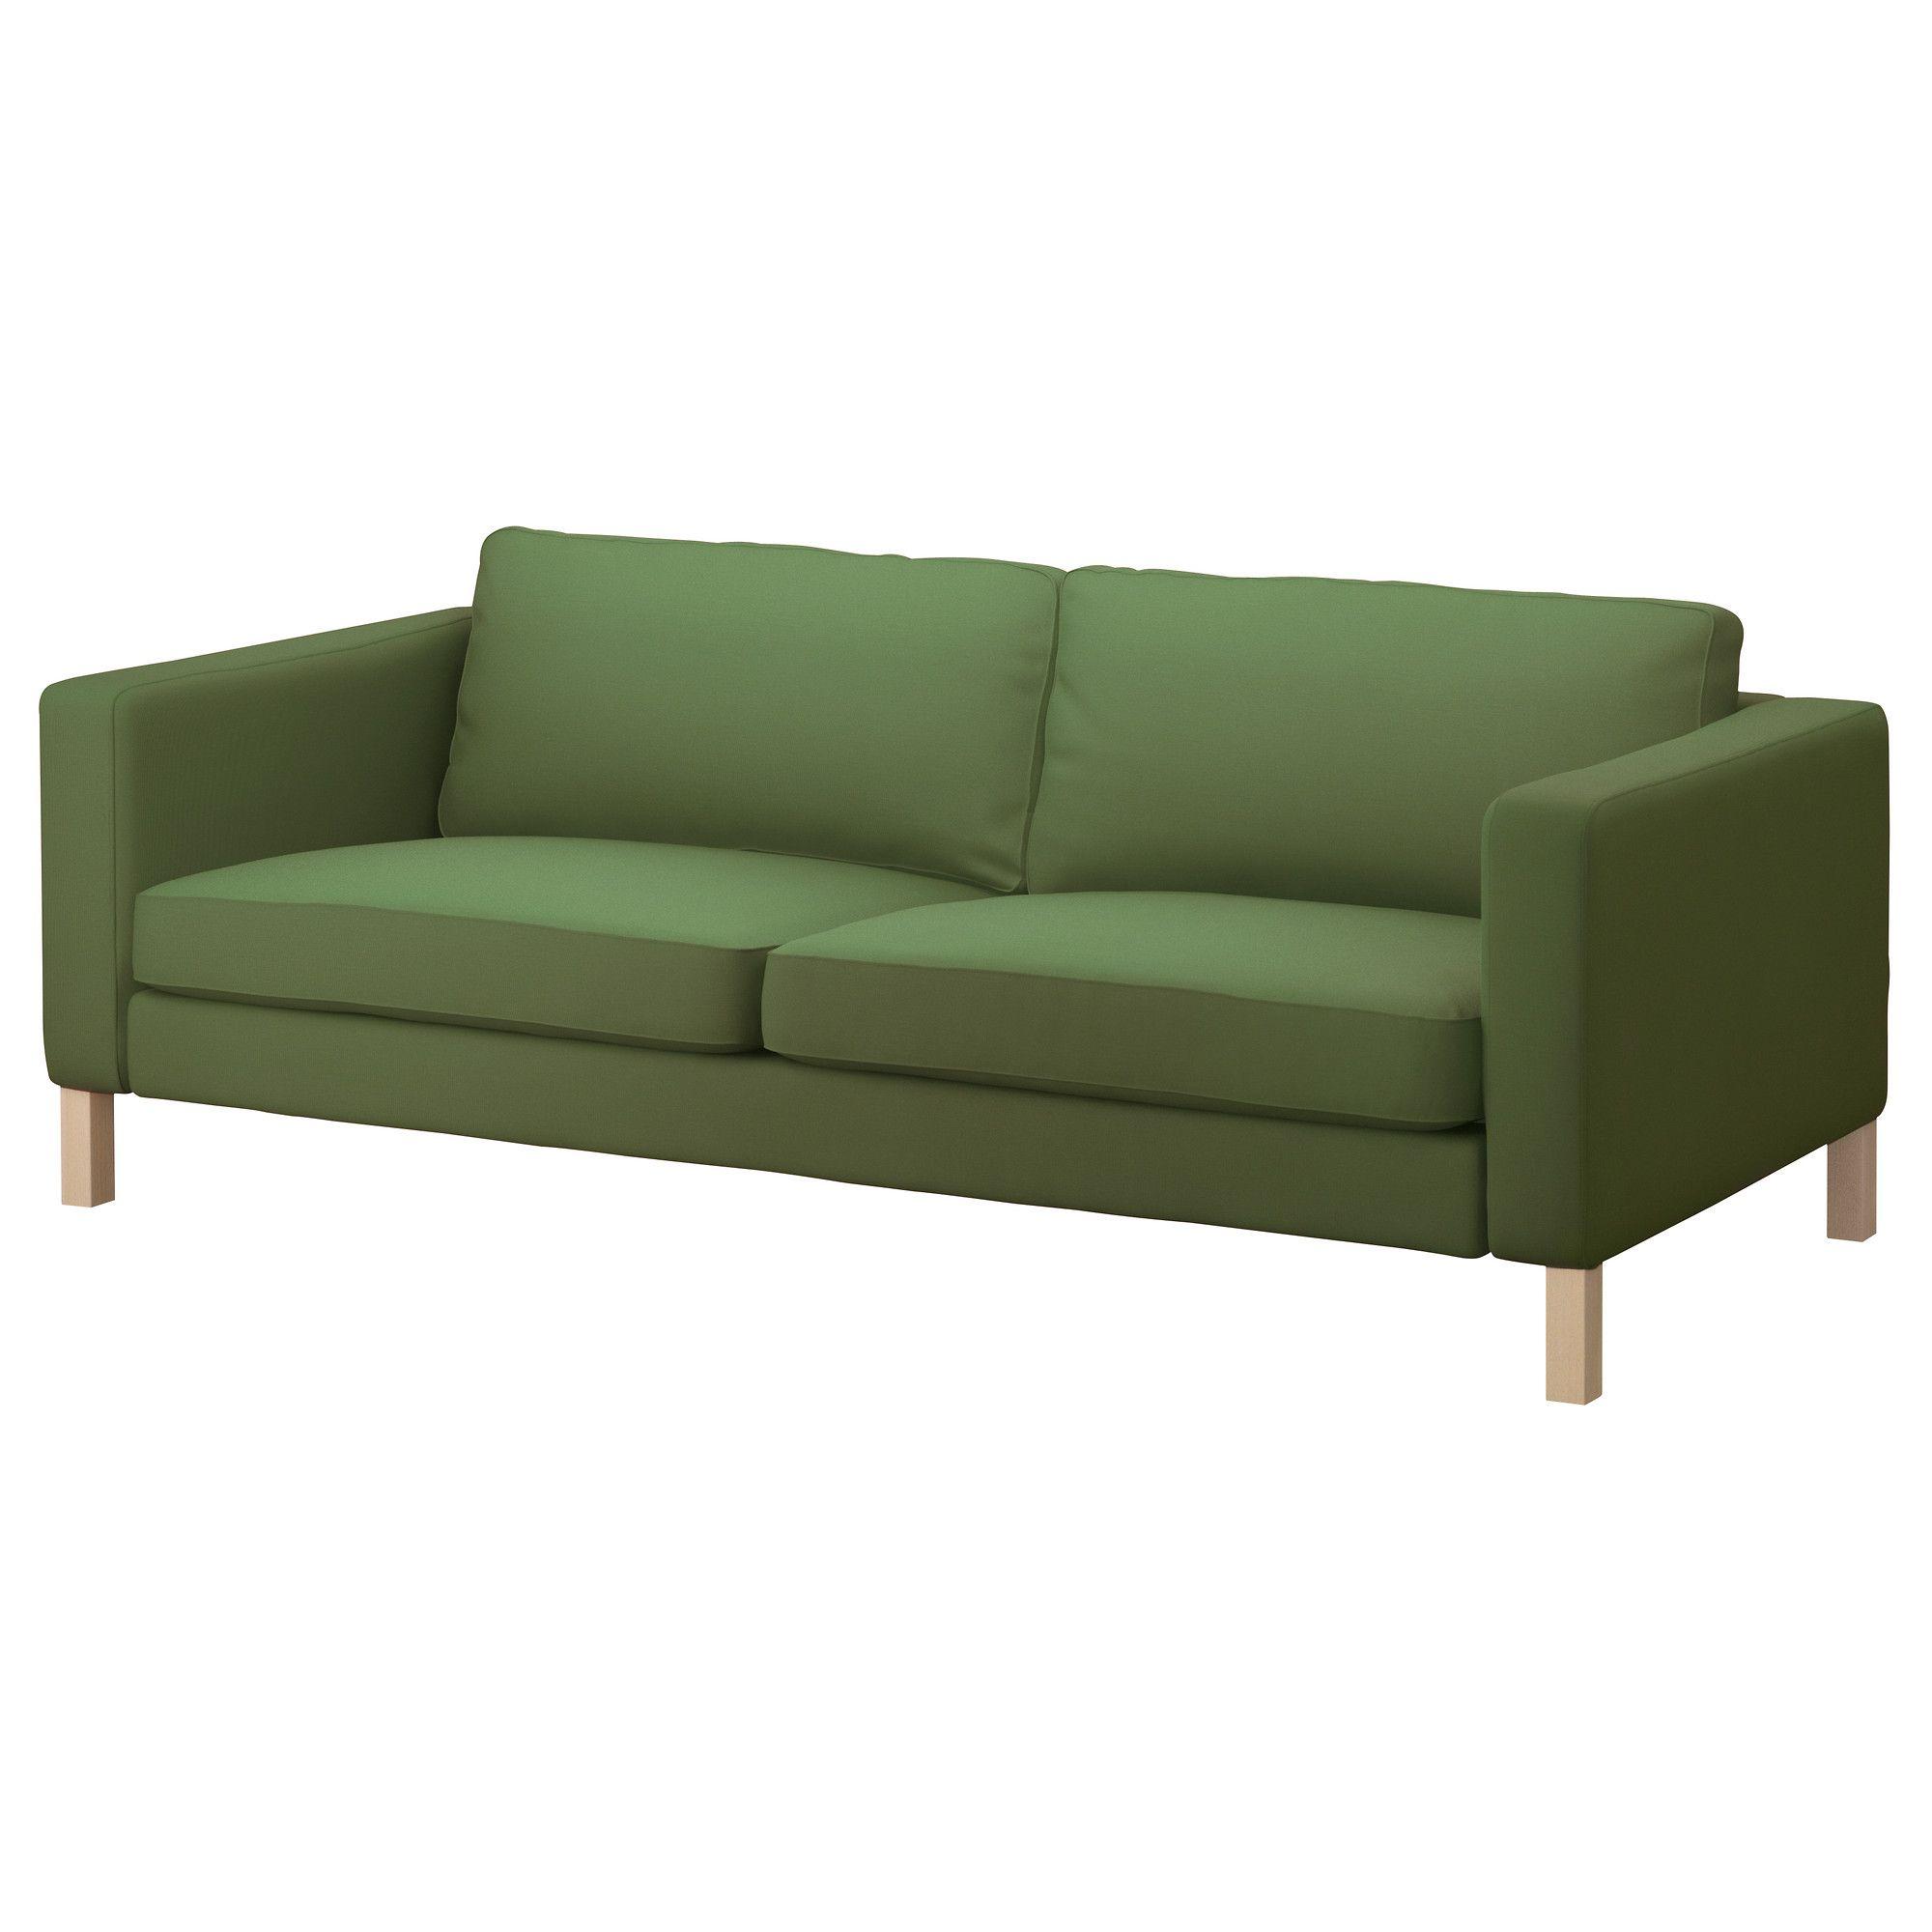 karlstad 3er sofa sivik gr n ikea die alte m nz pinterest waiting rooms sunroom and. Black Bedroom Furniture Sets. Home Design Ideas